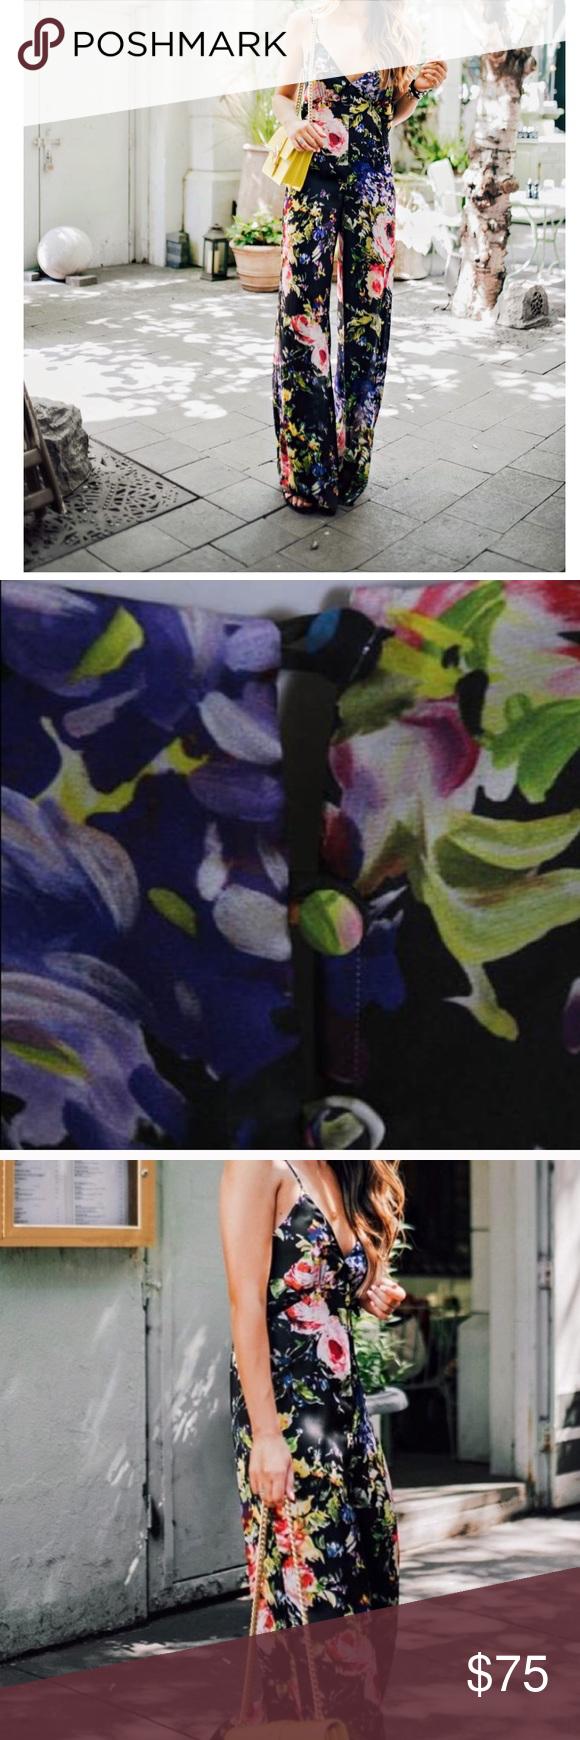 Jay Godfrey Black Floral Jumpsuit